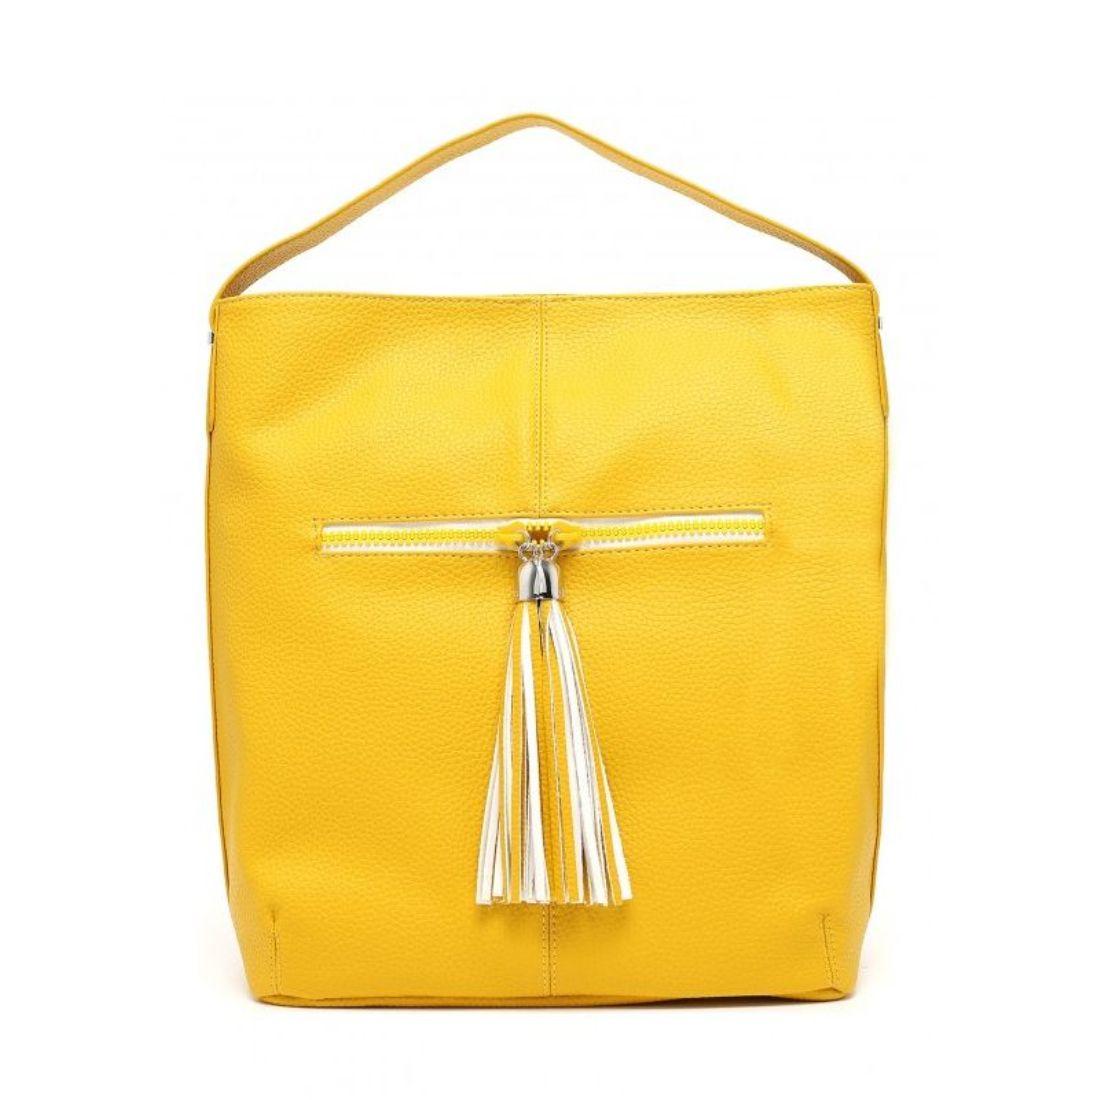 LIU JO Borsa Hobo EUBEA N16069 Empire Yellow - Bagsabout efd7ece7ca7